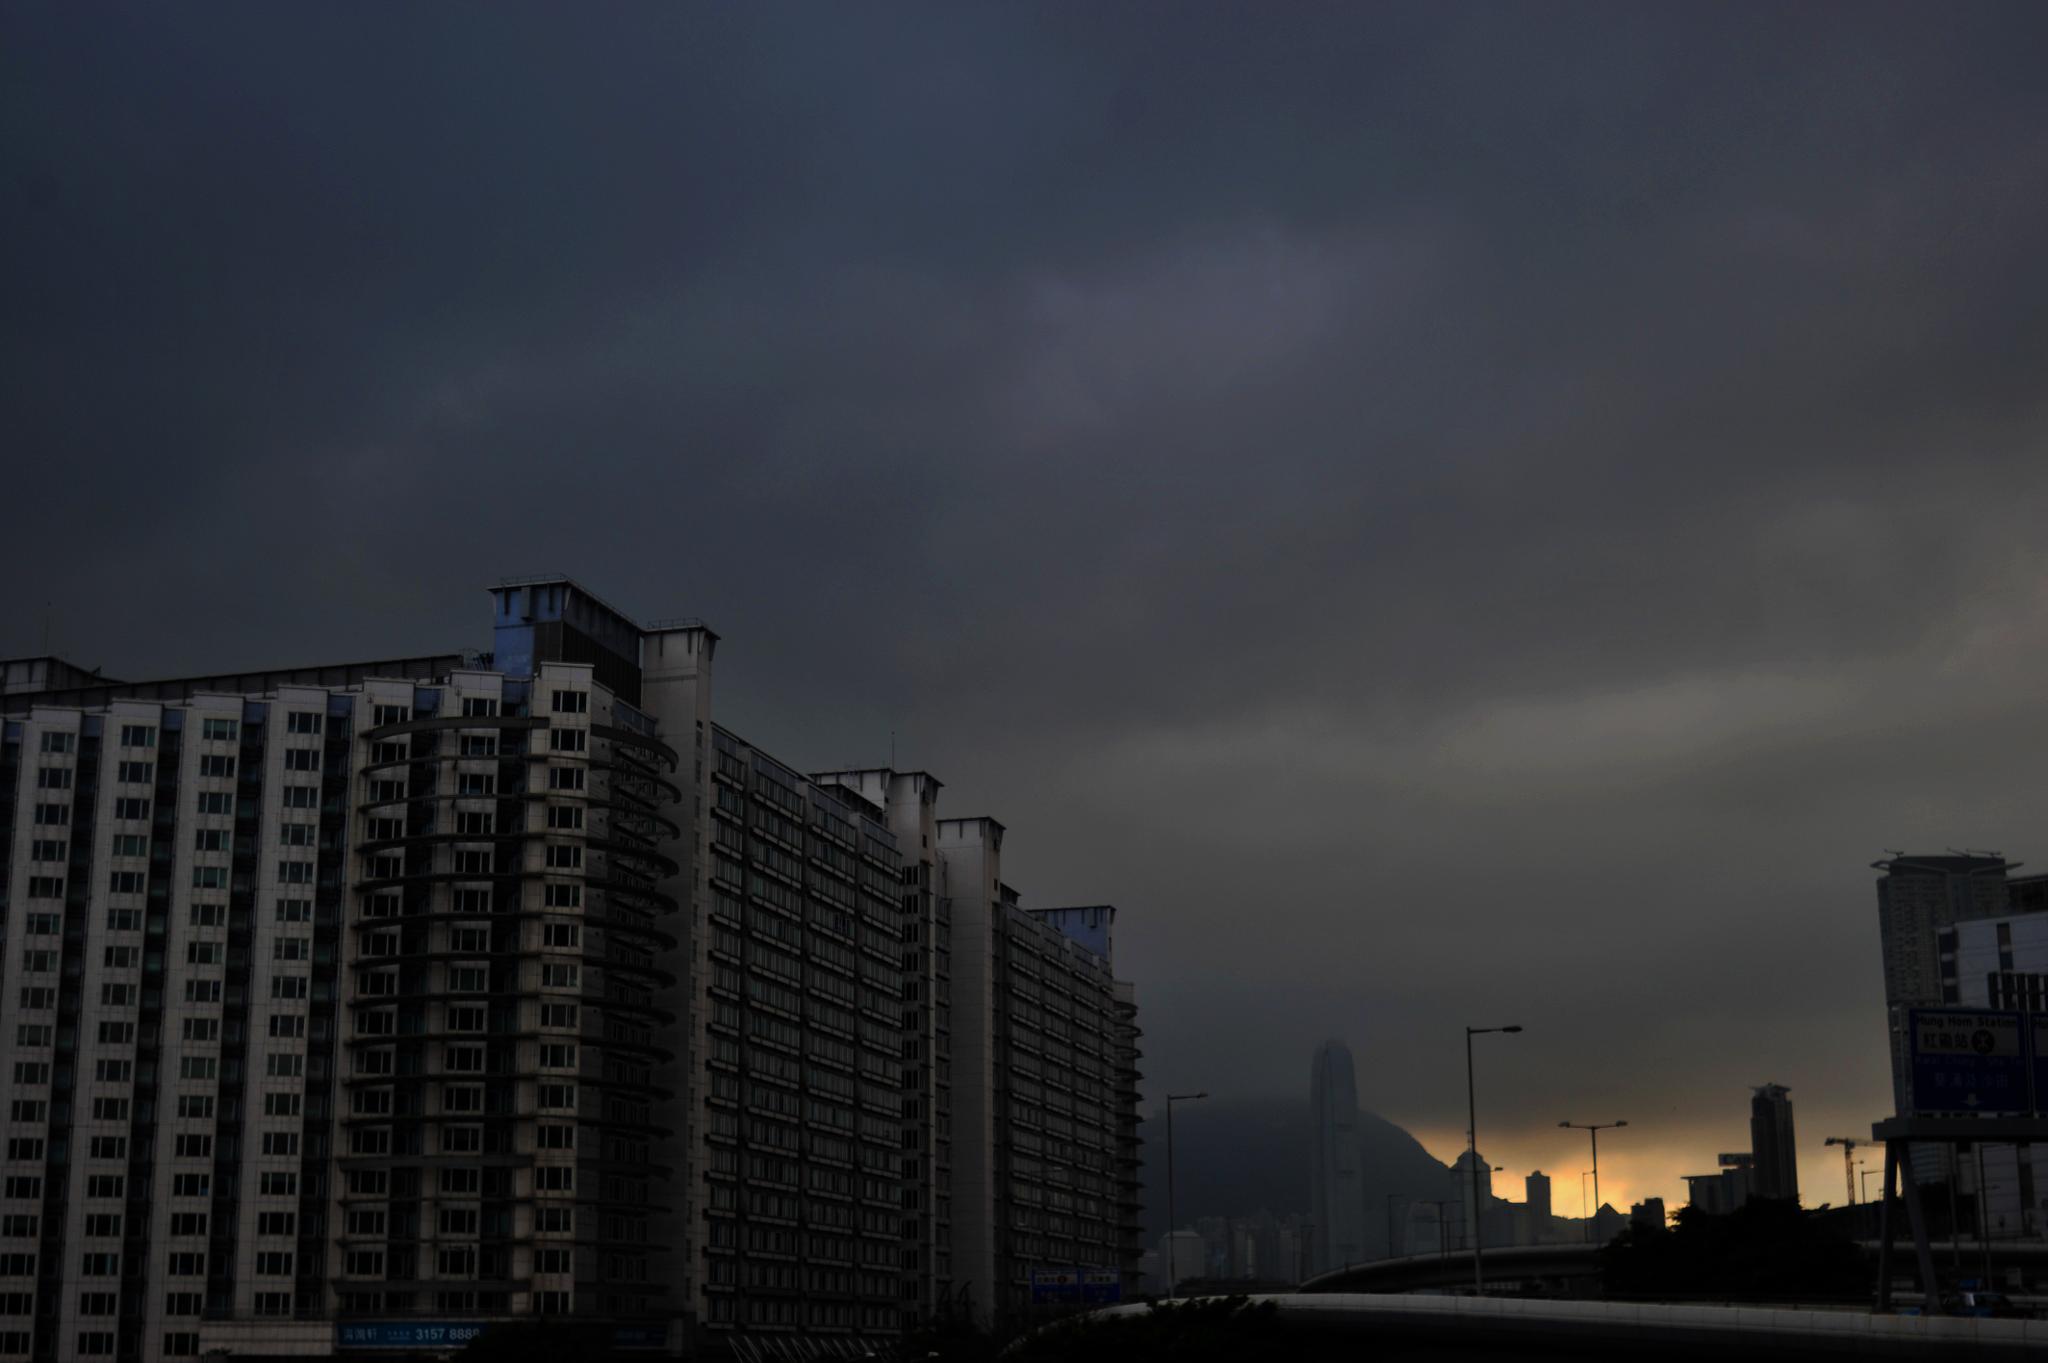 ...the building under a heavy sky... by cyccanhk